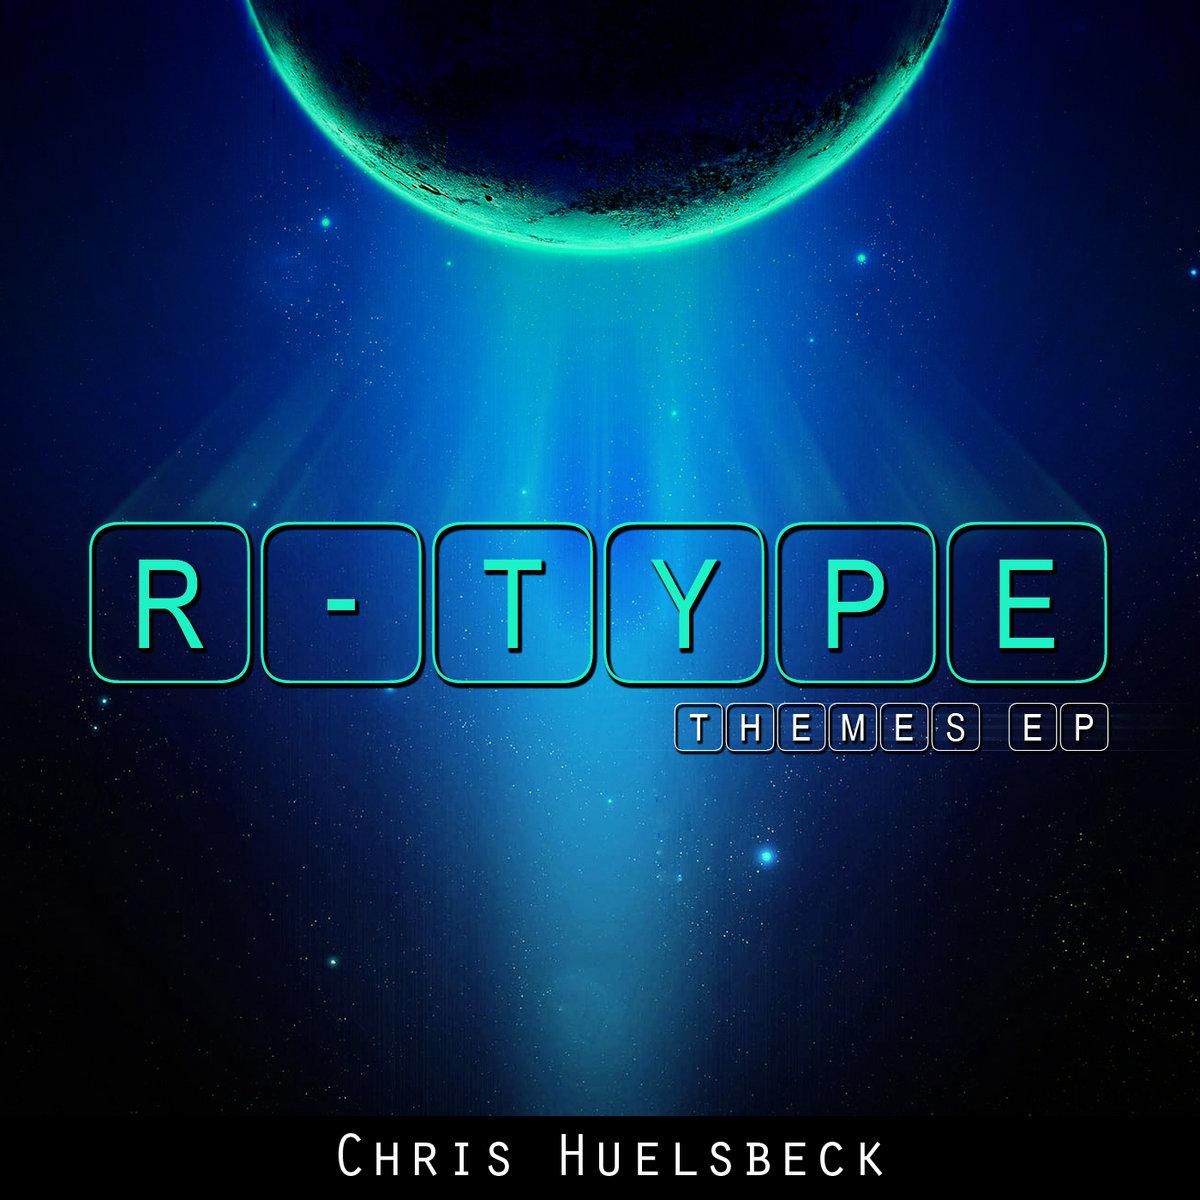 R-Type Amiga Theme (Original Sound Version) | Chris Huelsbeck